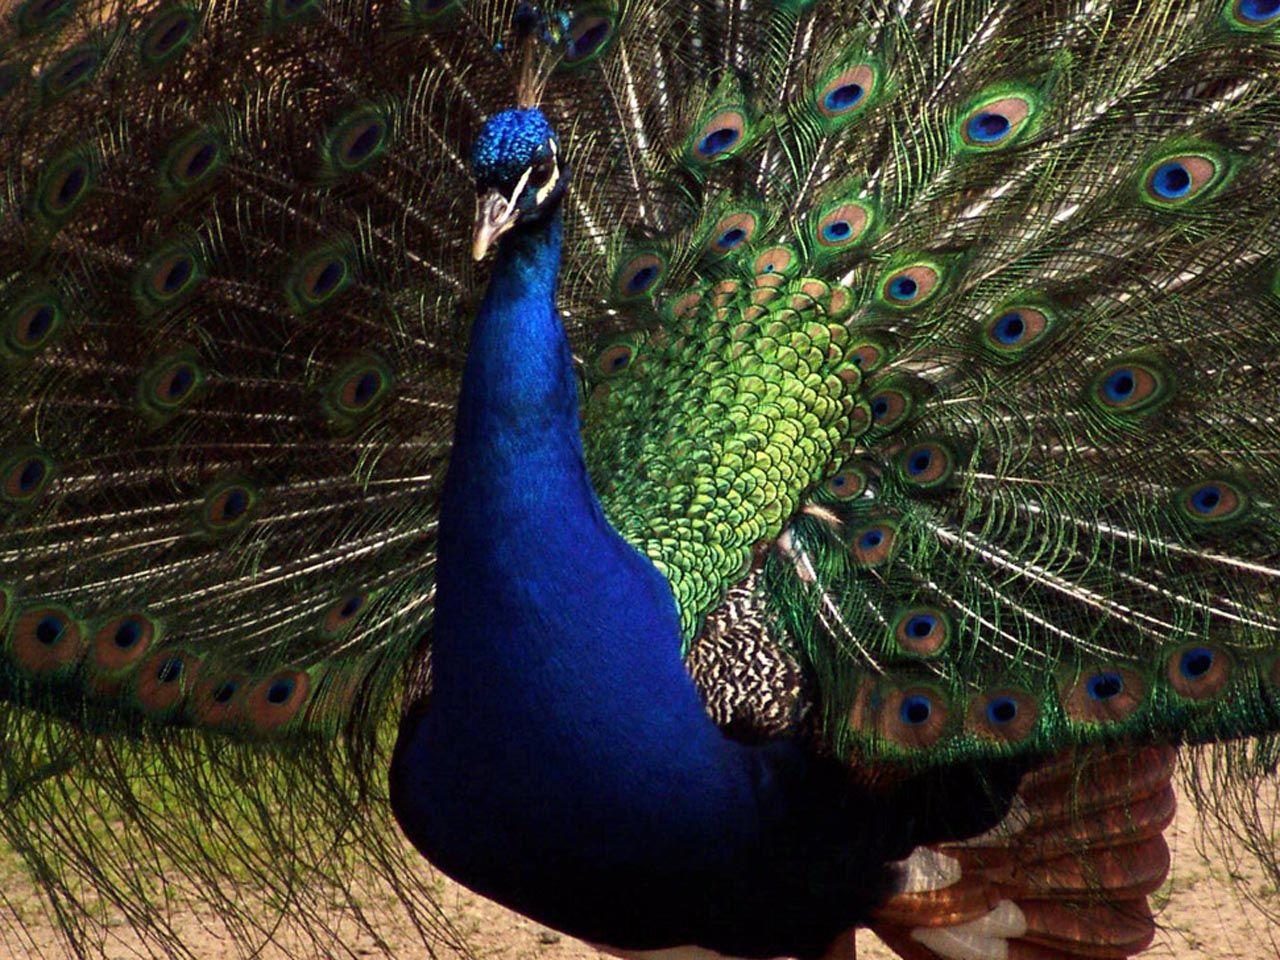 white blue peacock wallpaper - photo #18